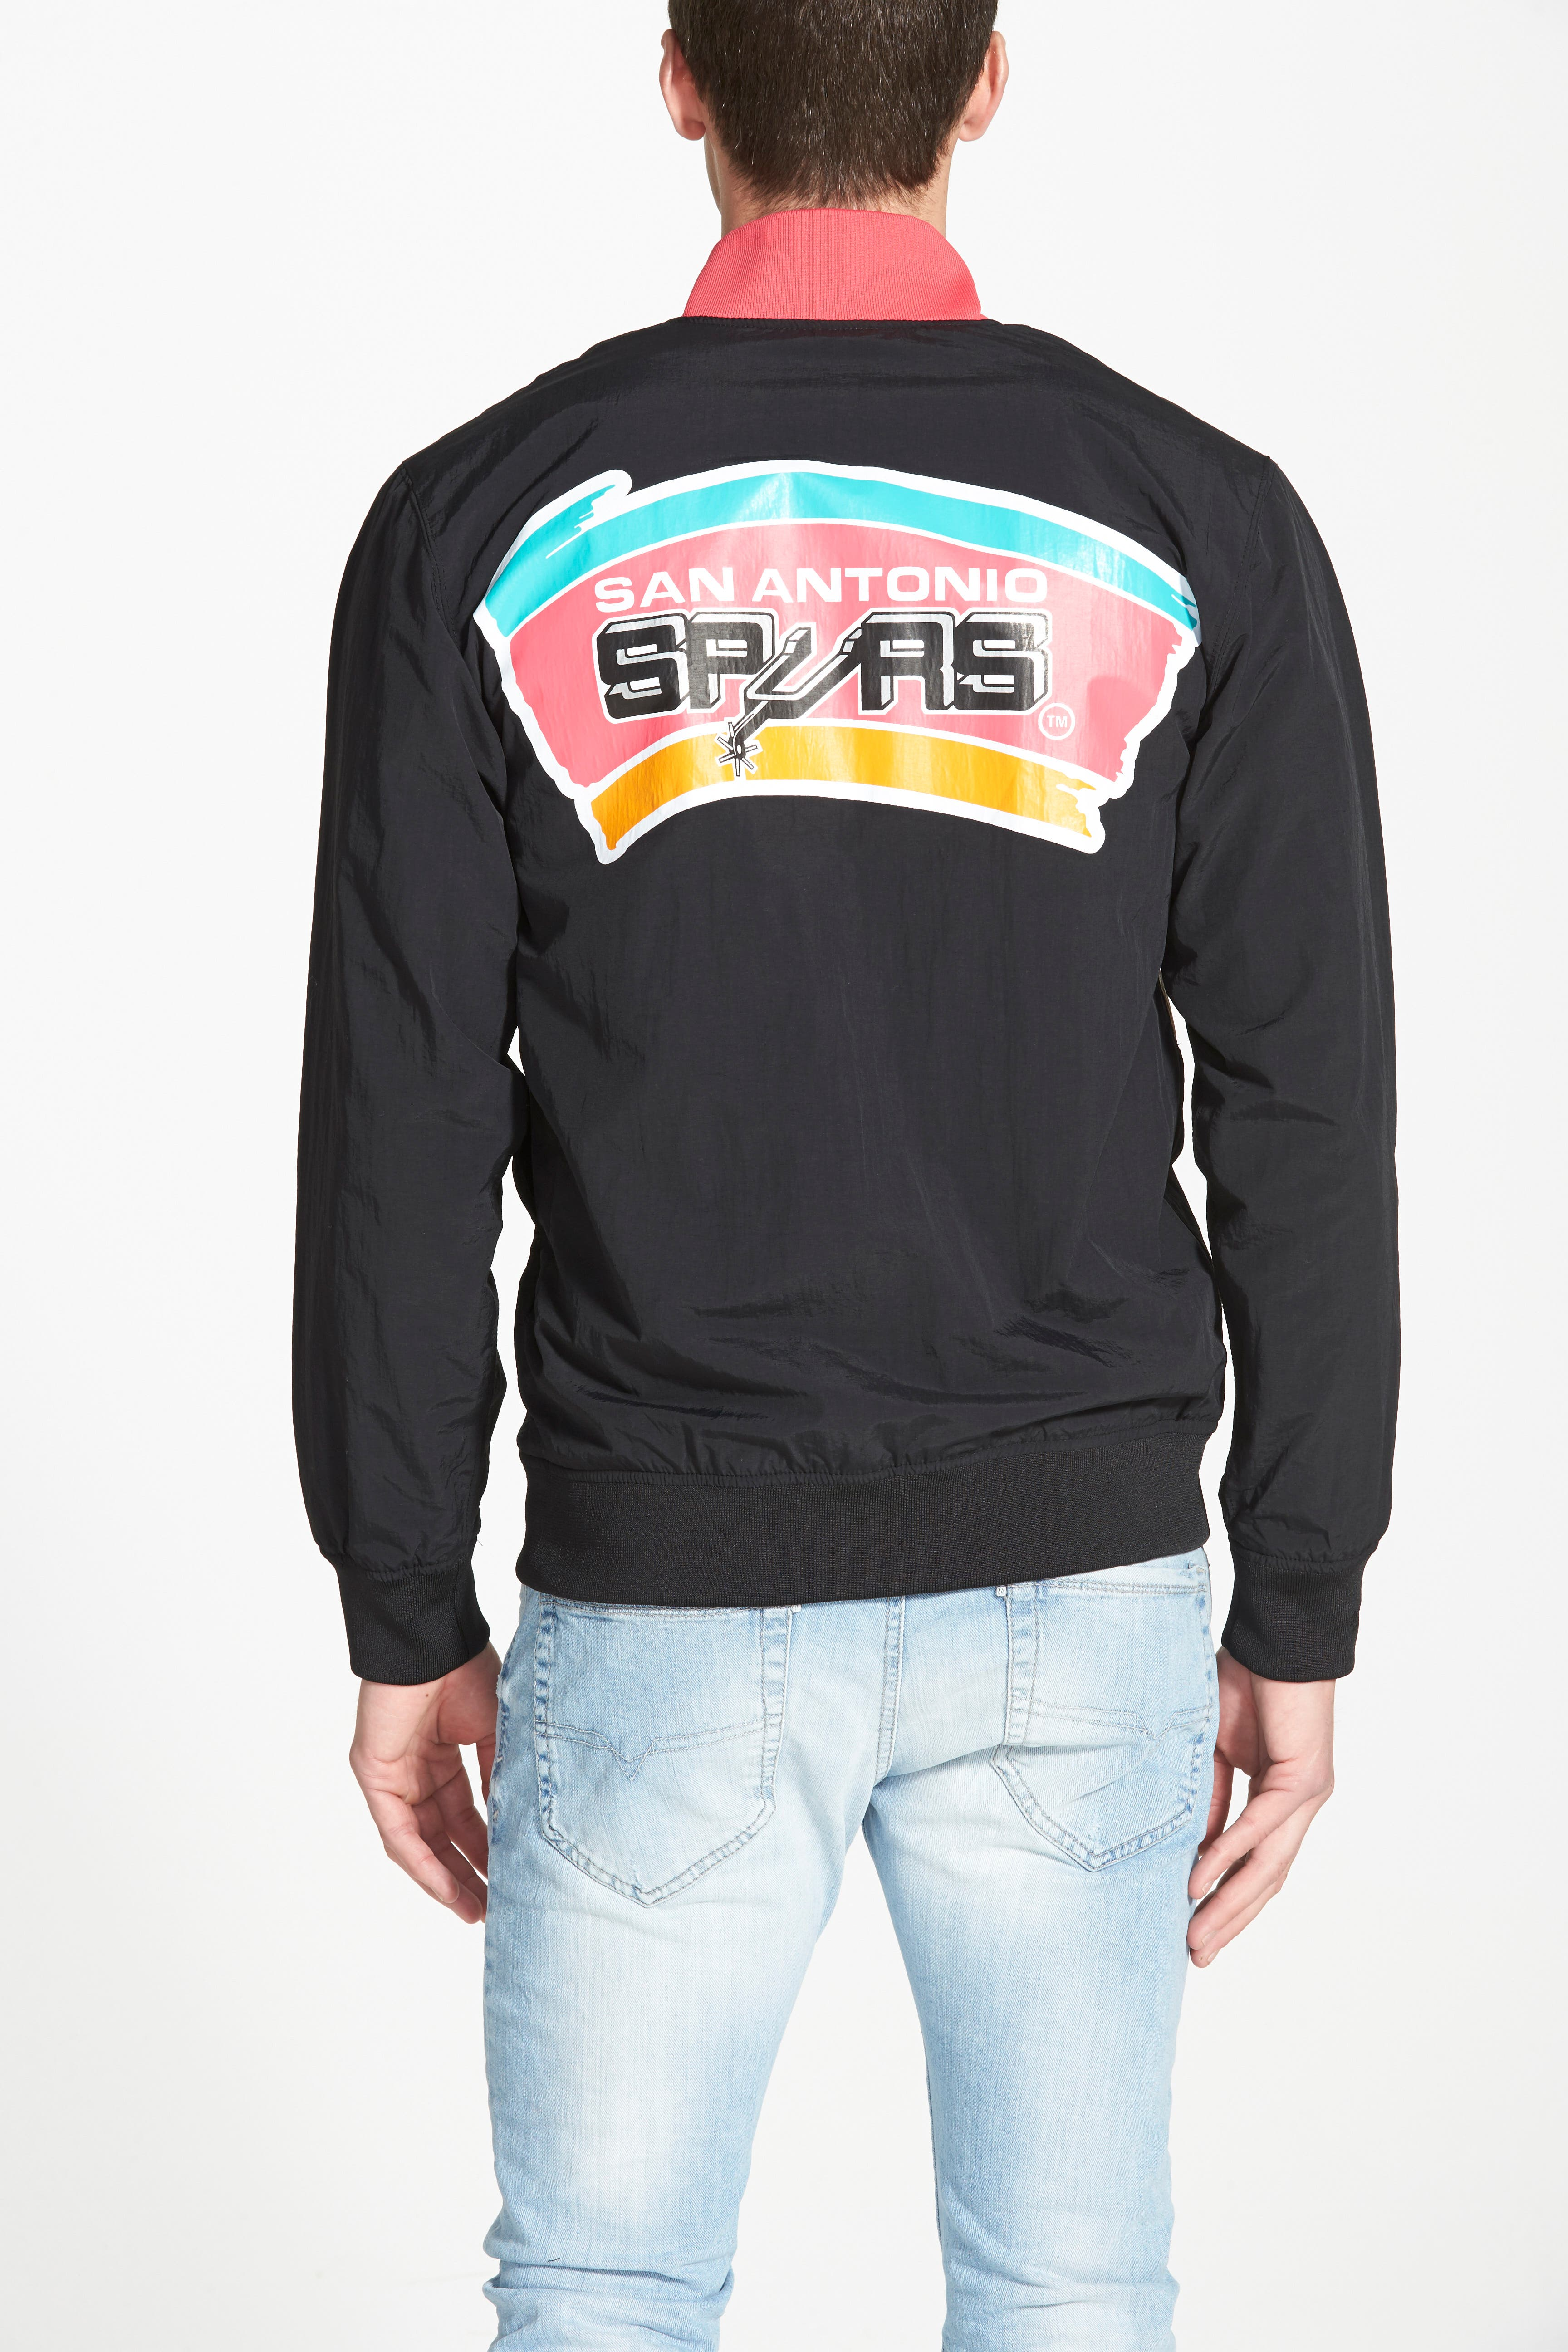 MITCHELL & NESS,                             'San Antonio Spurs' Warm-Up Jacket,                             Alternate thumbnail 3, color,                             001